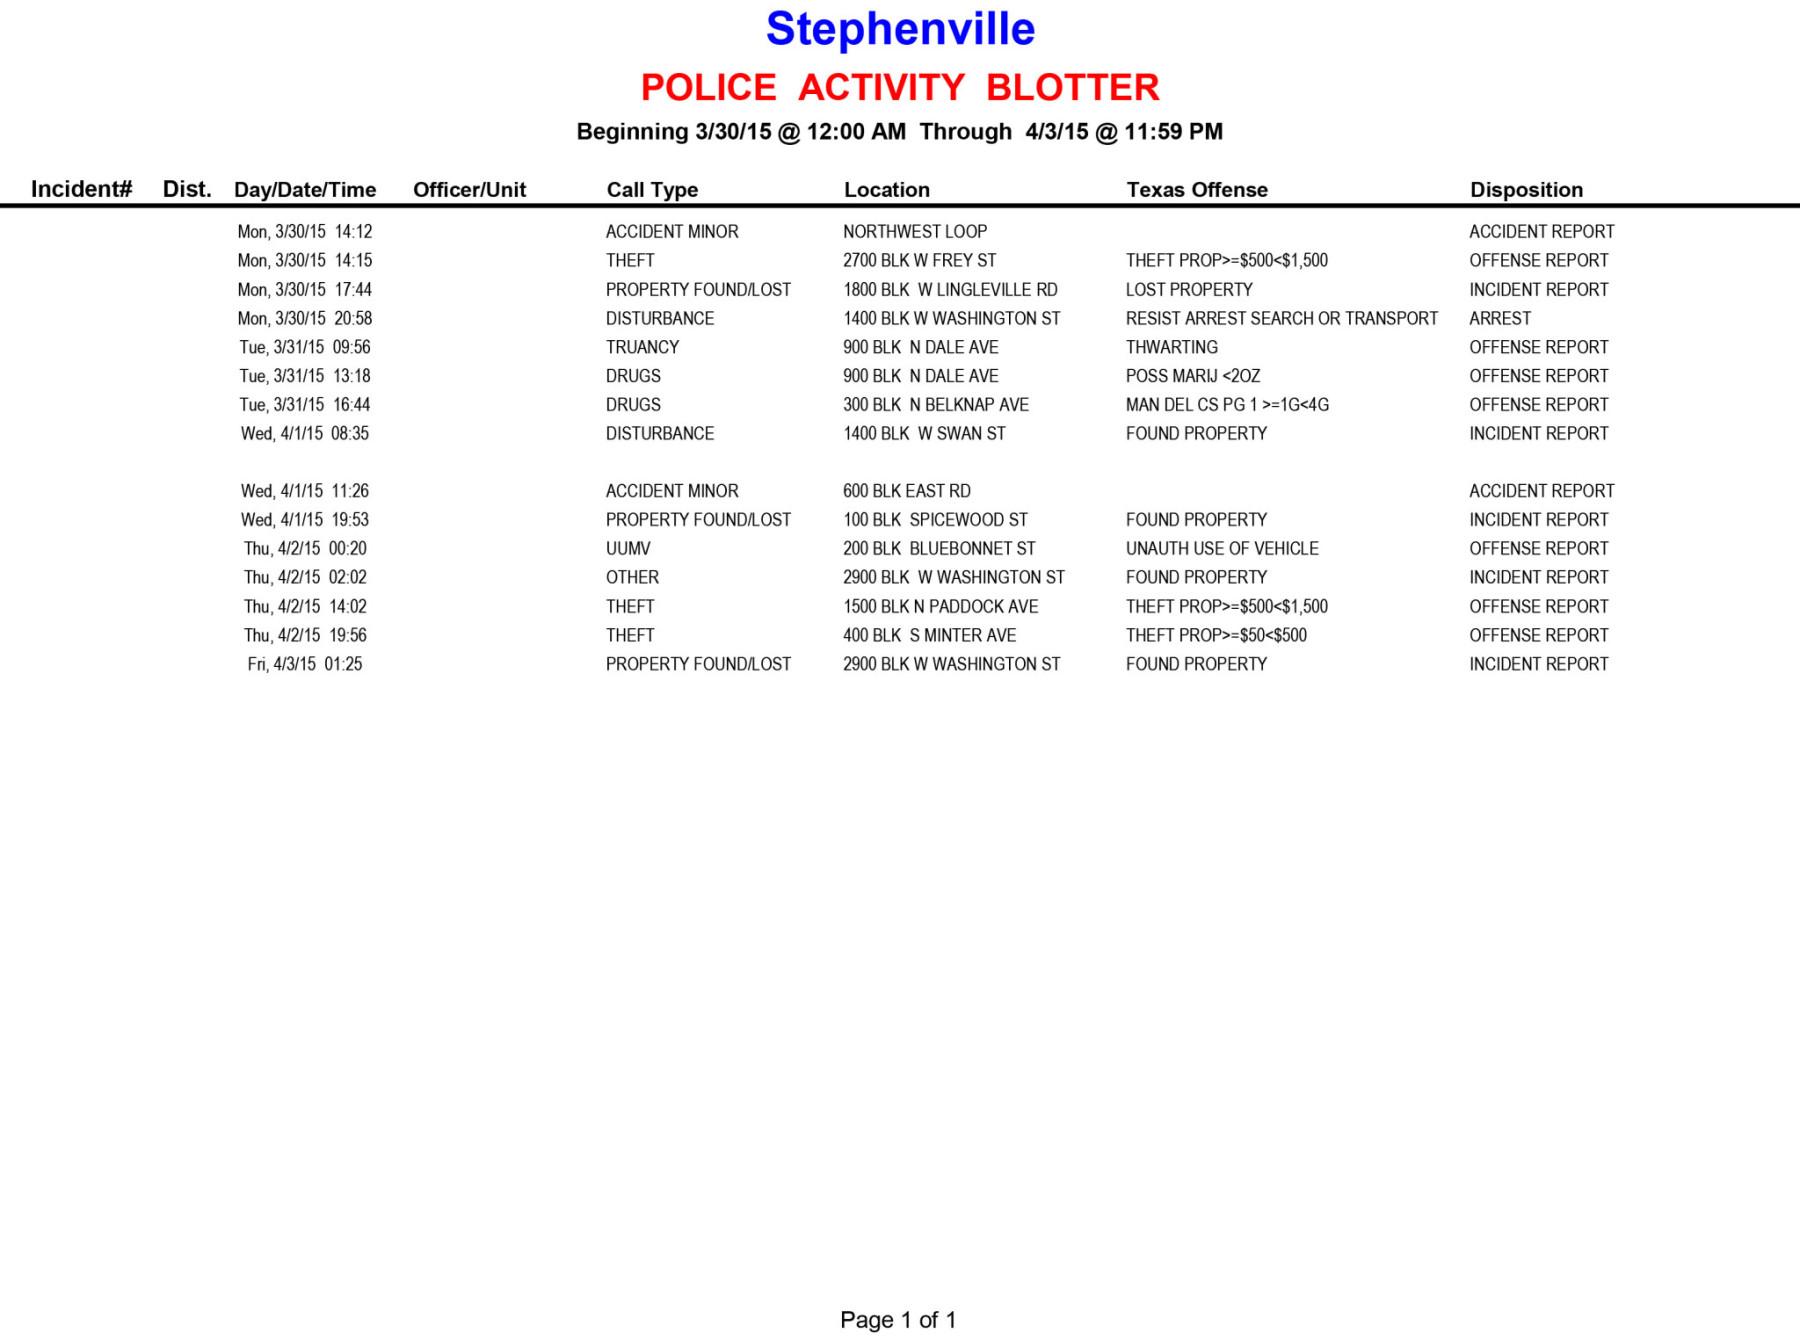 20150330-0403 Police Activity Blotter